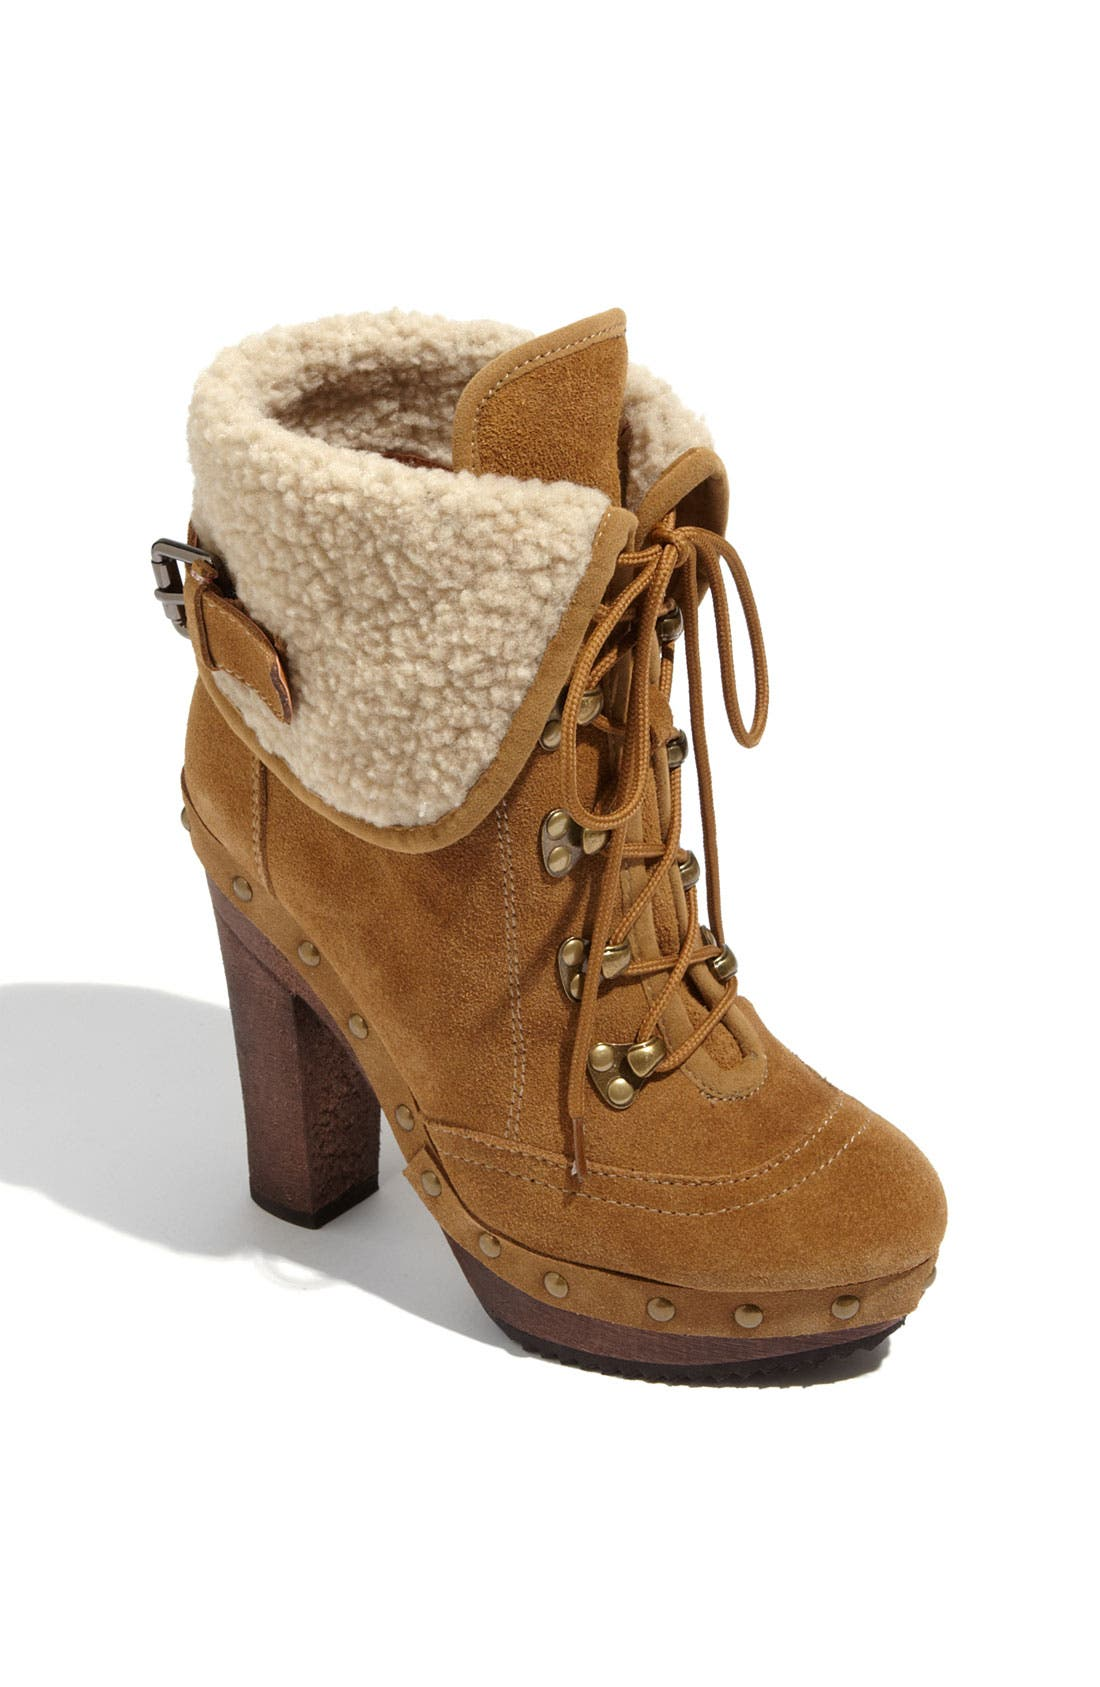 Alternate Image 1 Selected - N.Y.L.A. 'Teodor' Ankle Boot